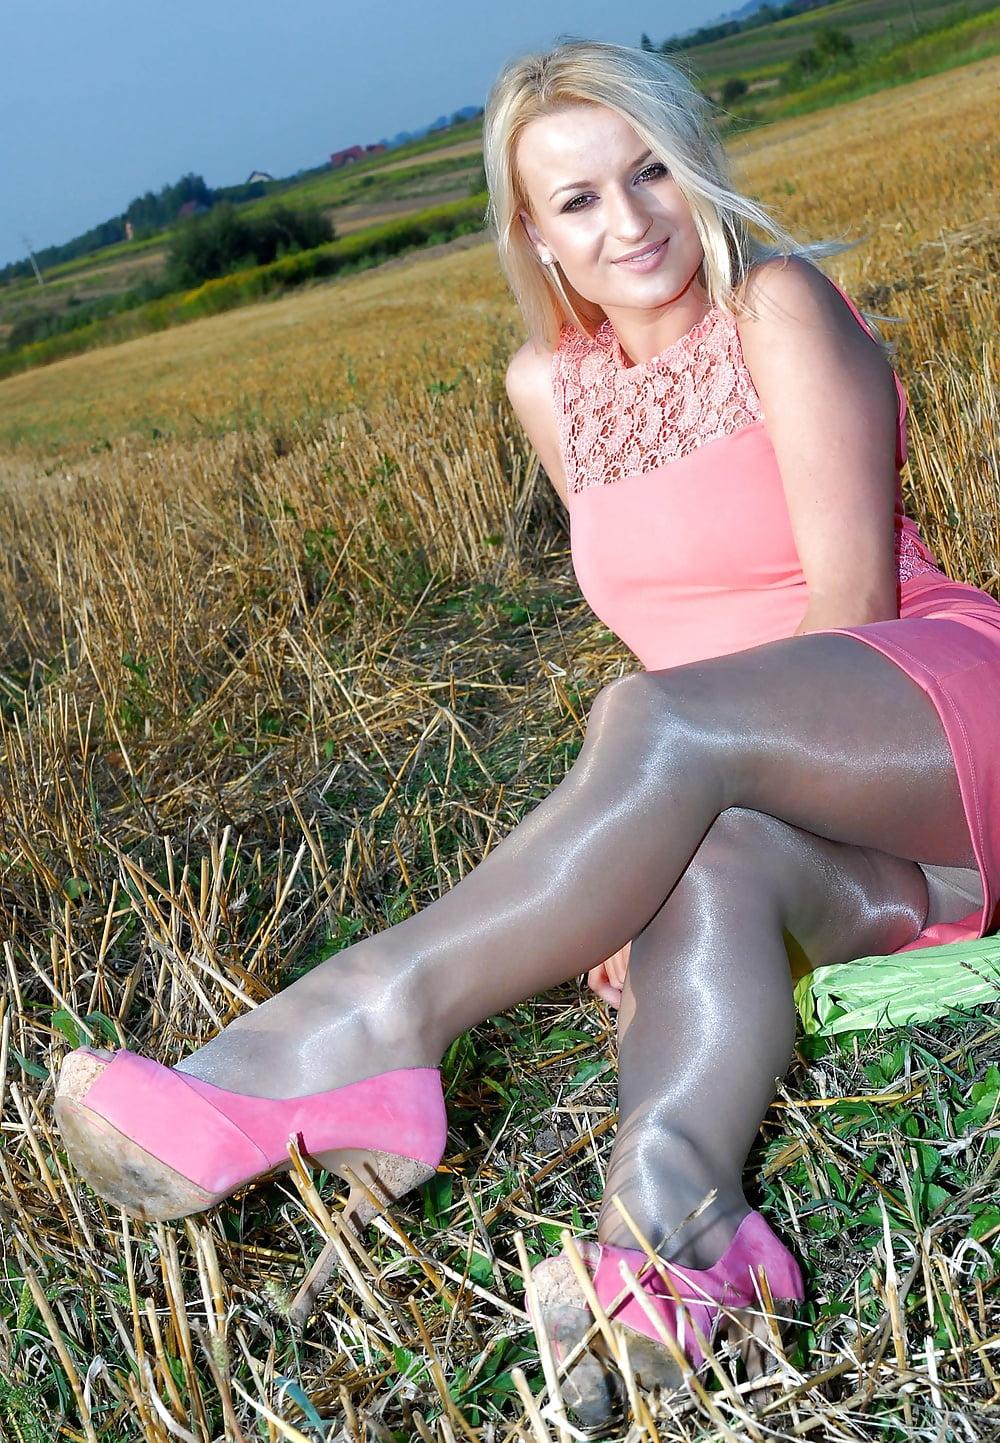 dream-sexy-legs-pantyhose-free-sites-gif